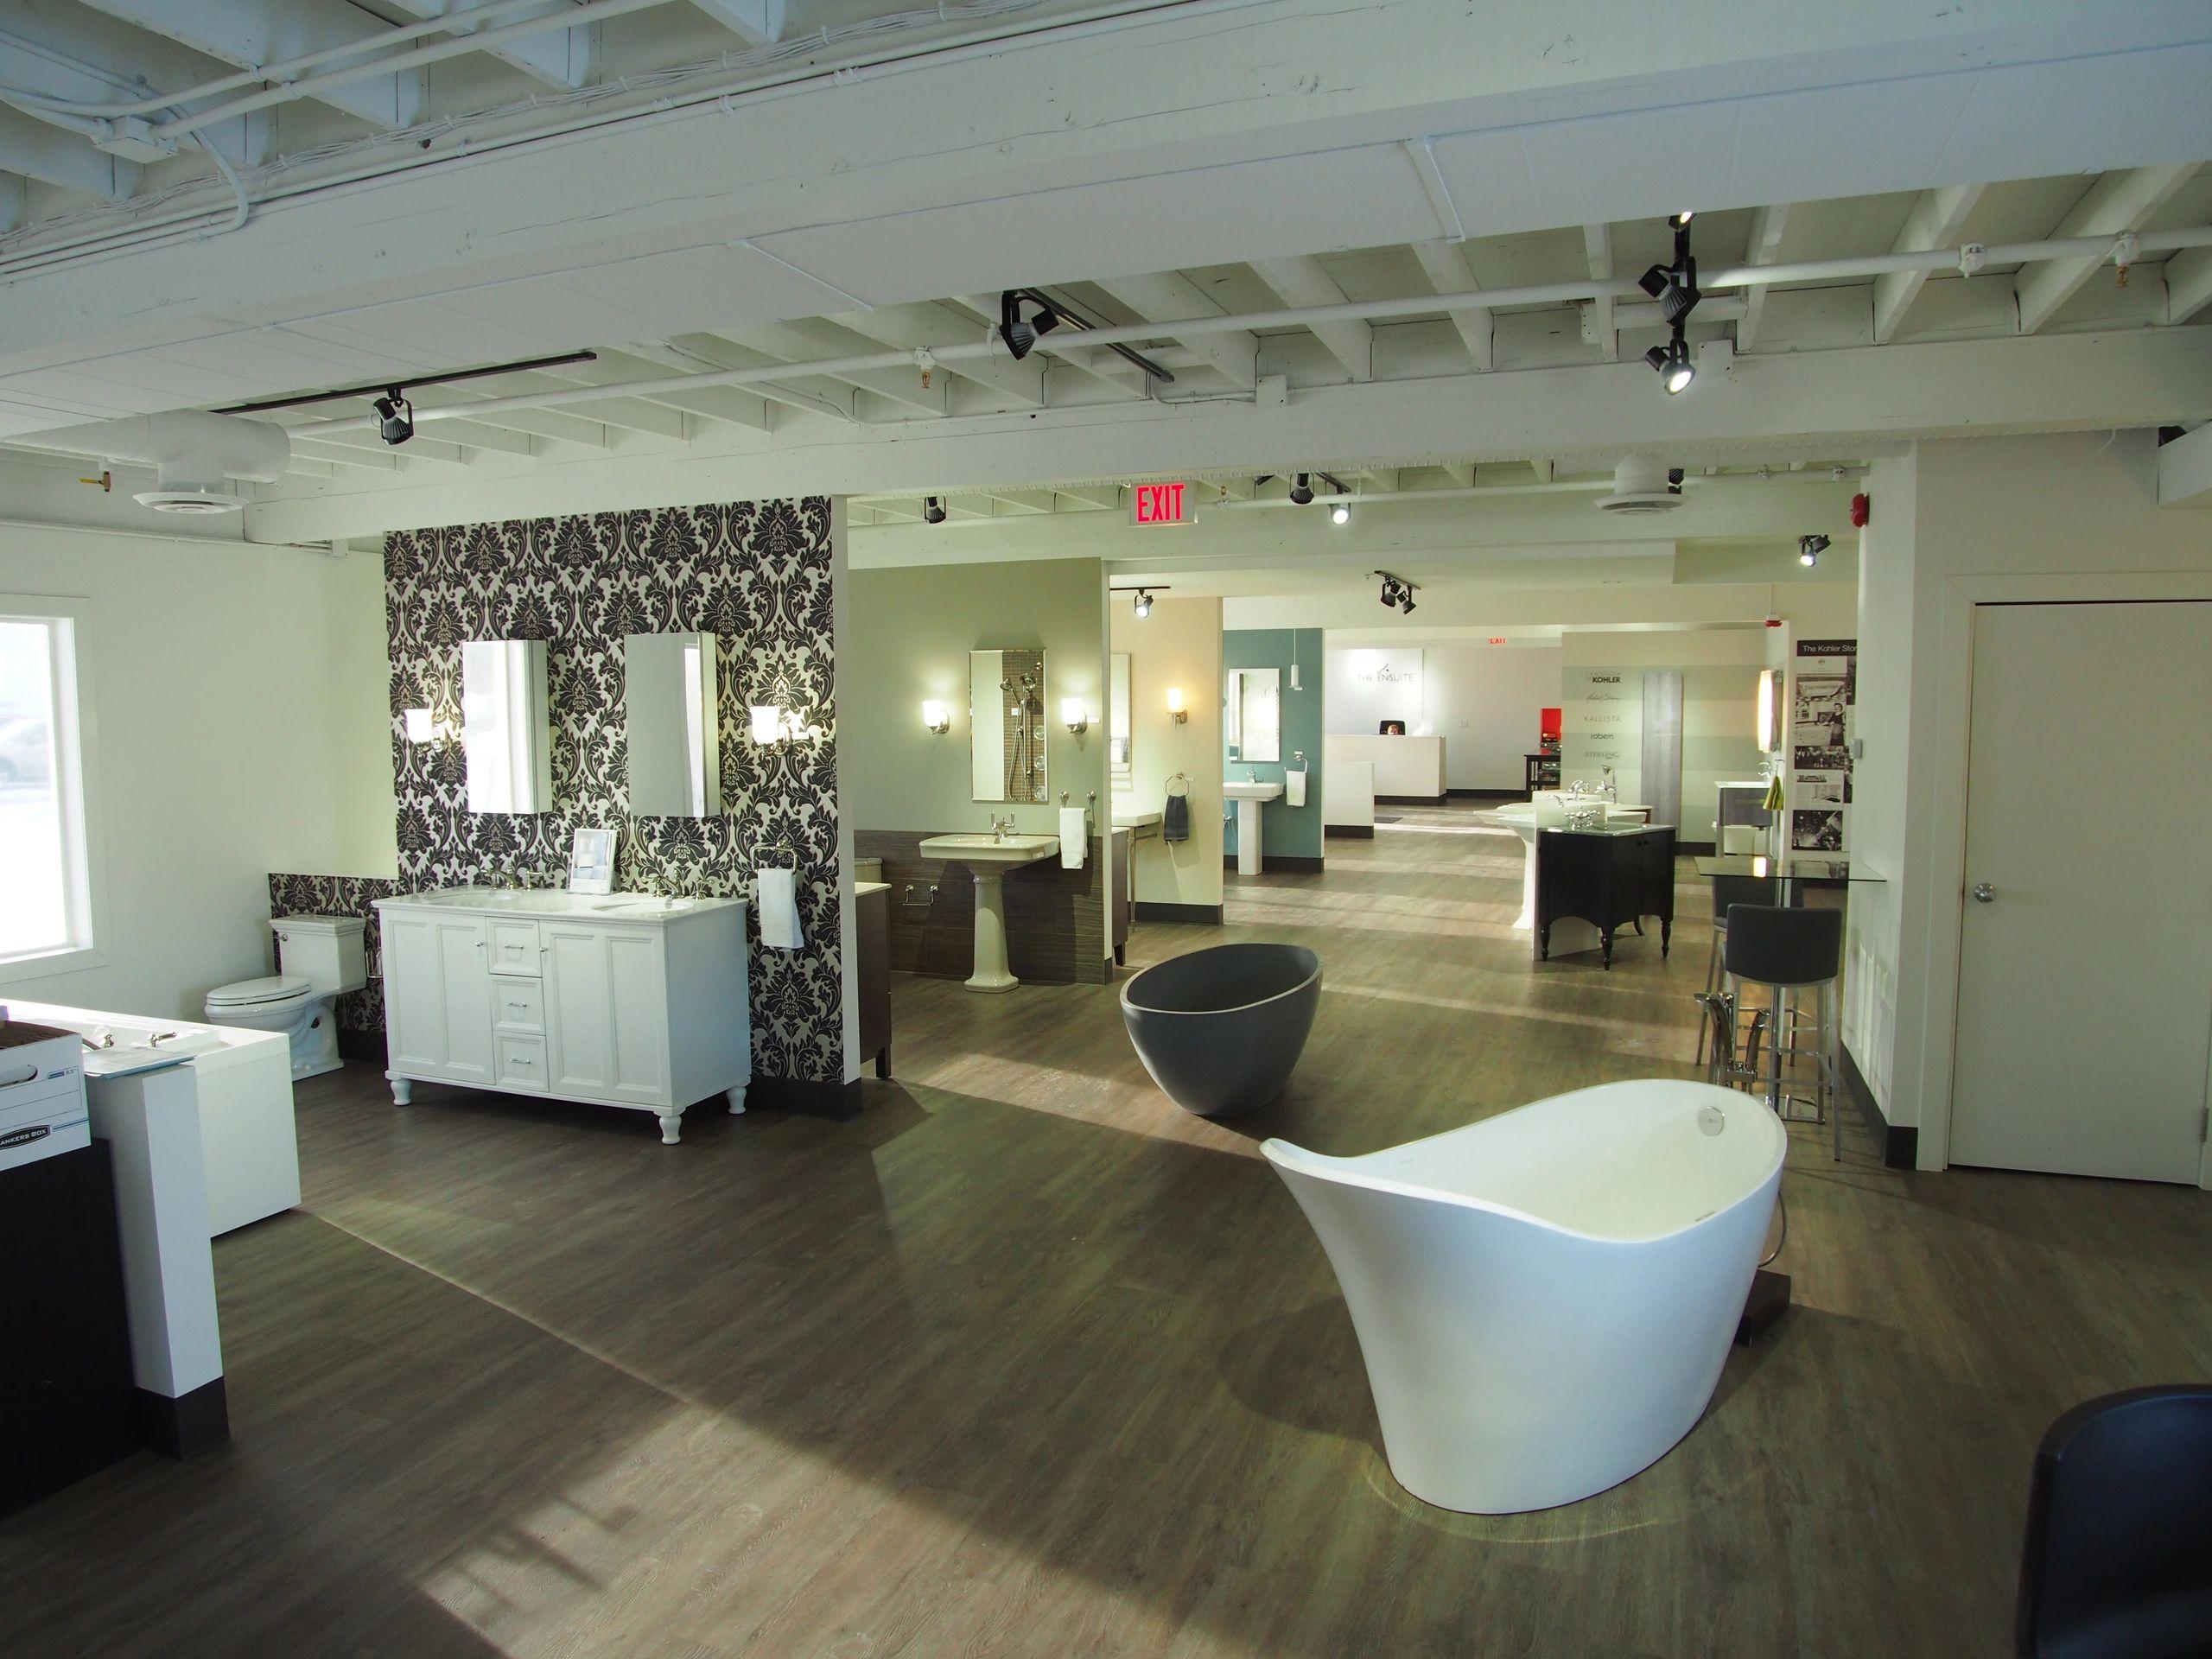 Fancy Kohler Kallista Images - Bathtub Design Ideas - valtak.com